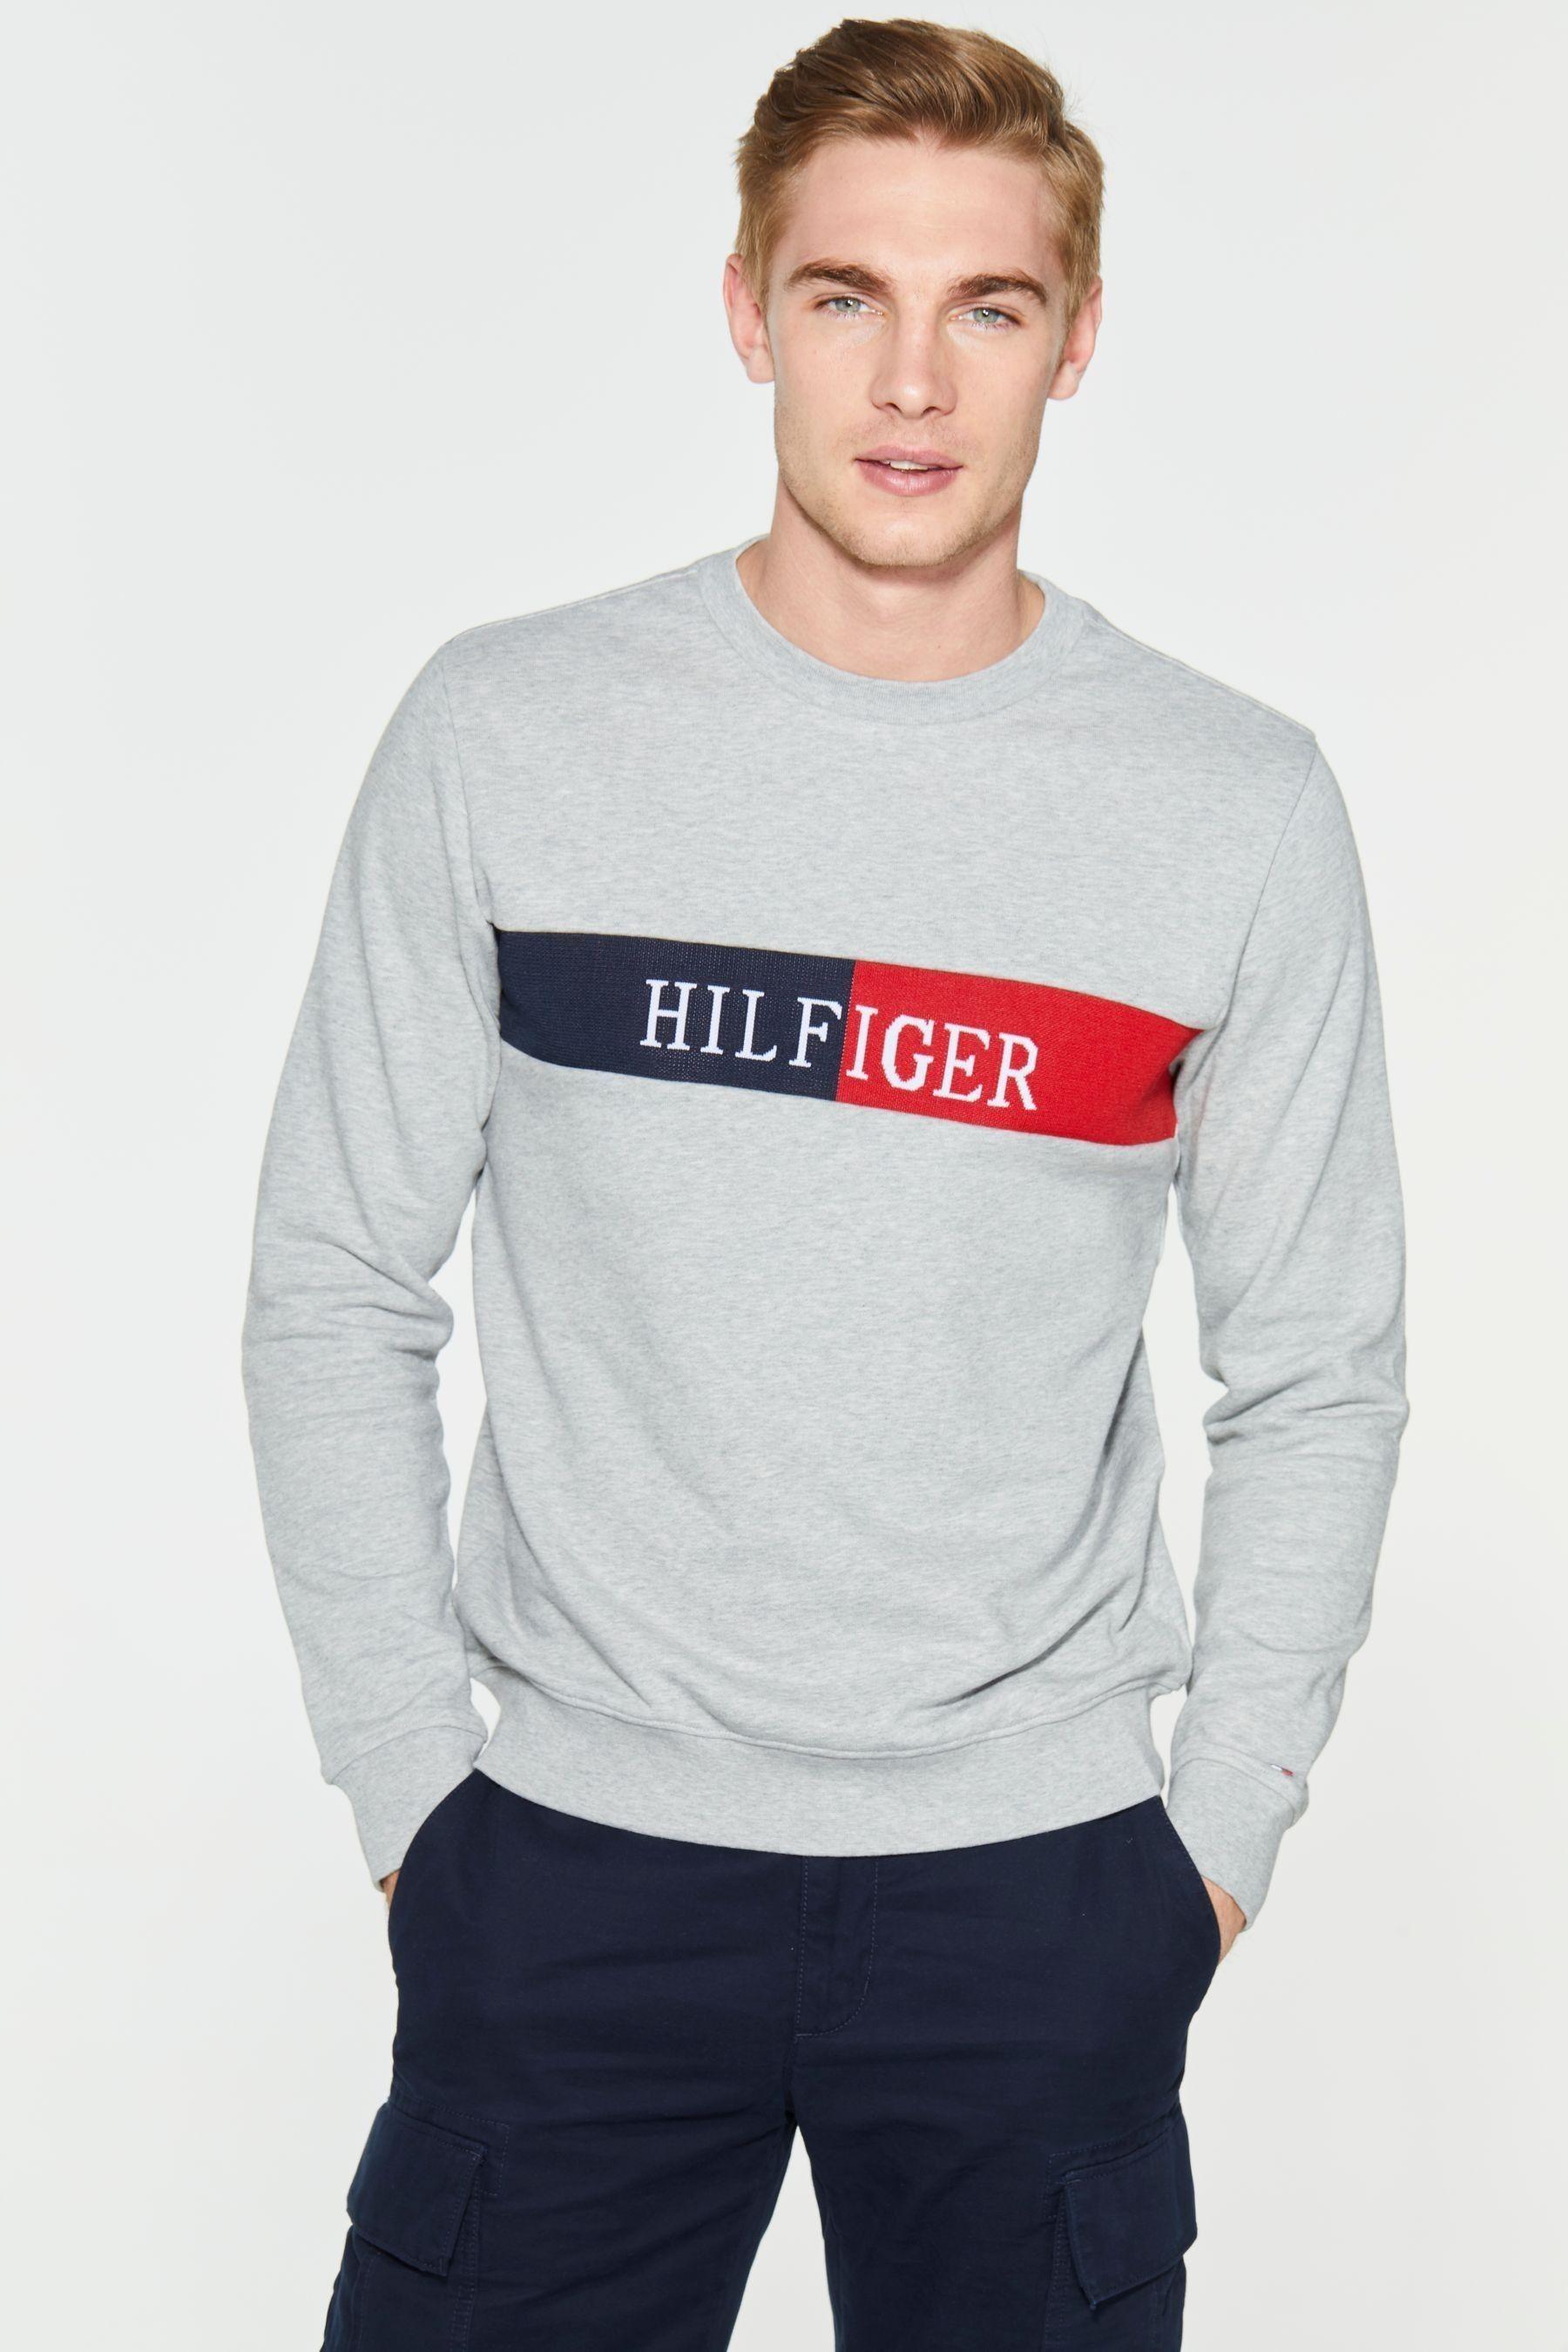 Mens Tommy Hilfiger Intarsia Sweatshirt Grey Sweatshirts Long Sleeve Tshirt Men Hilfiger [ 2700 x 1800 Pixel ]